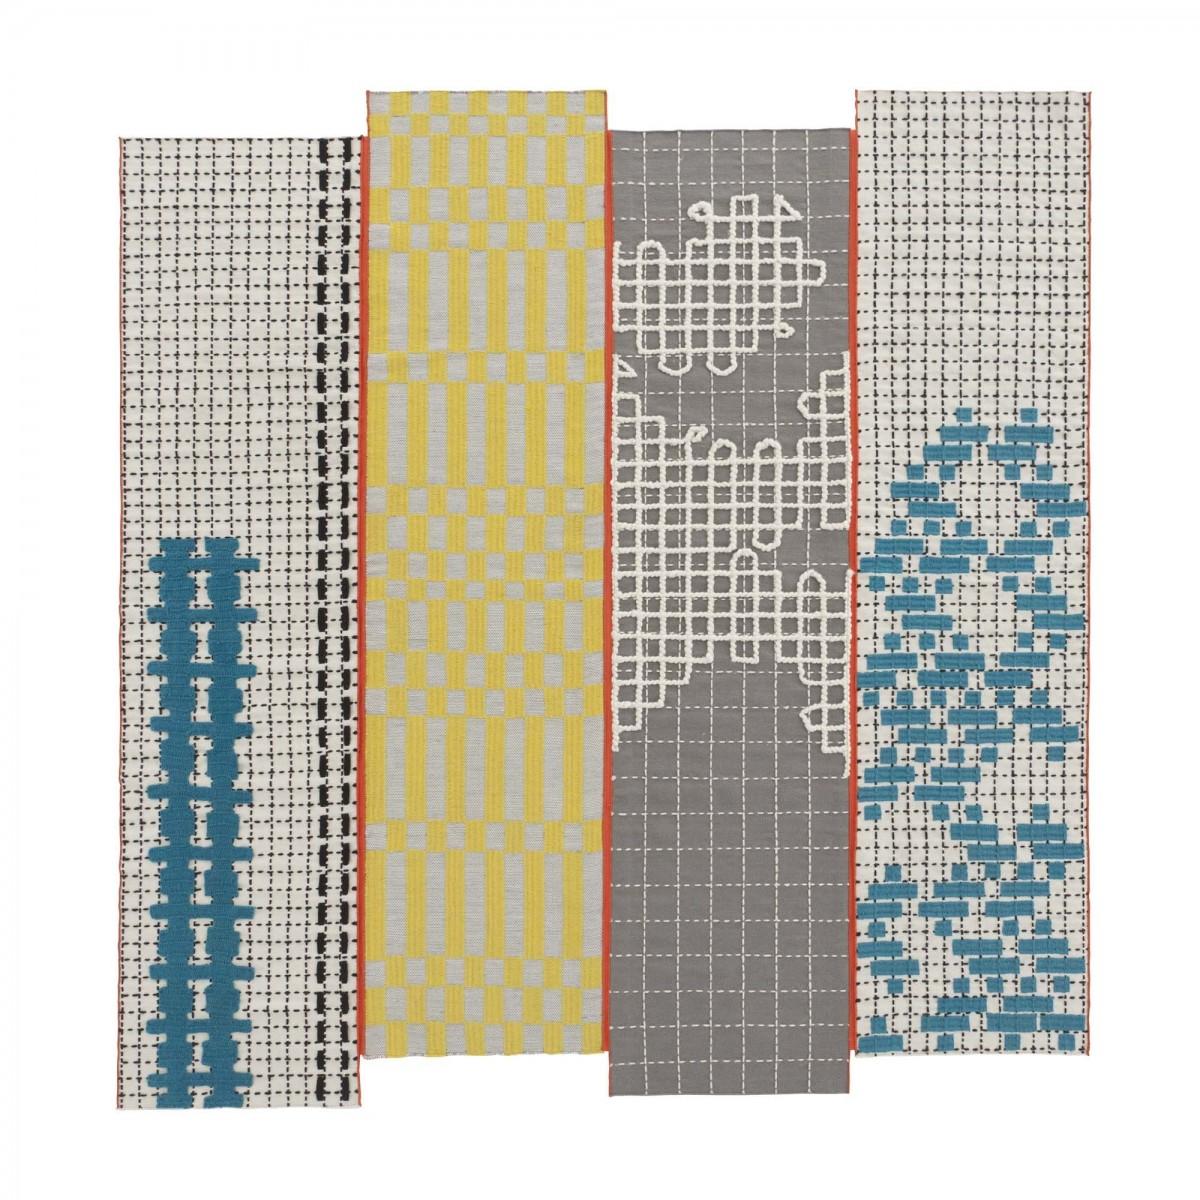 bandas carpet gan rugs. Black Bedroom Furniture Sets. Home Design Ideas